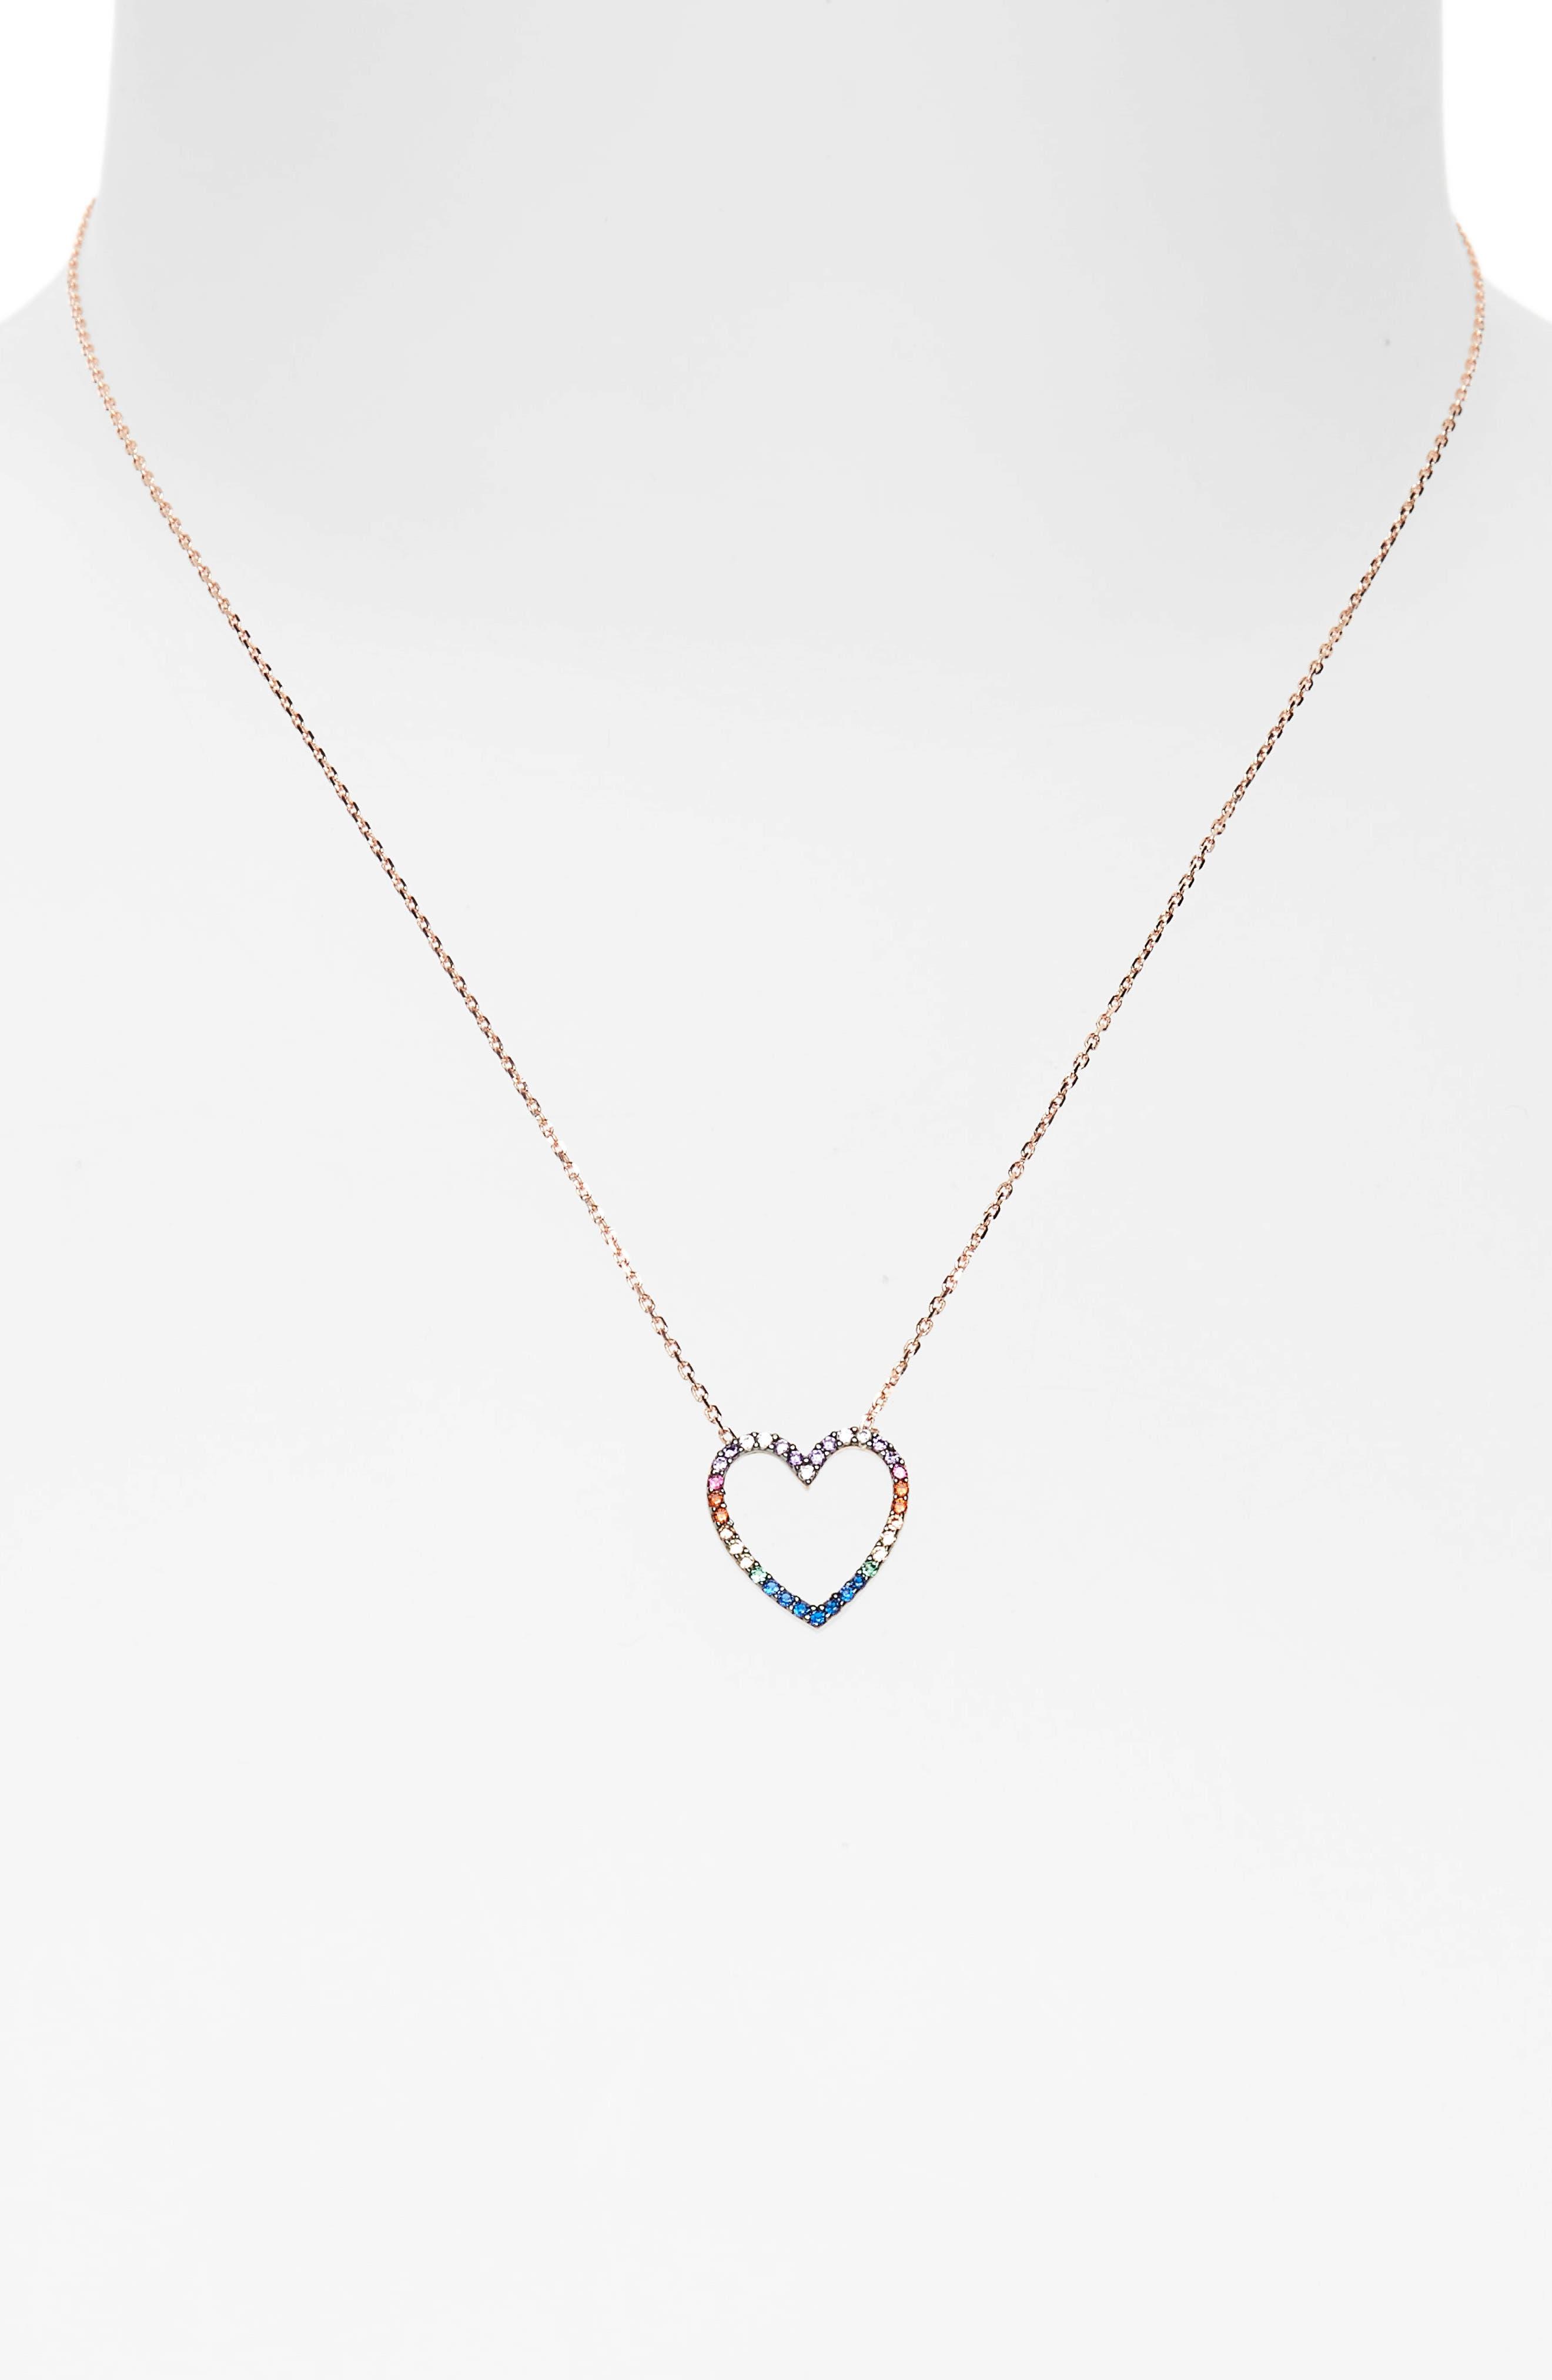 Rainbow Heart Pendant Necklace,                             Alternate thumbnail 2, color,                             Rose Gold/ Multi